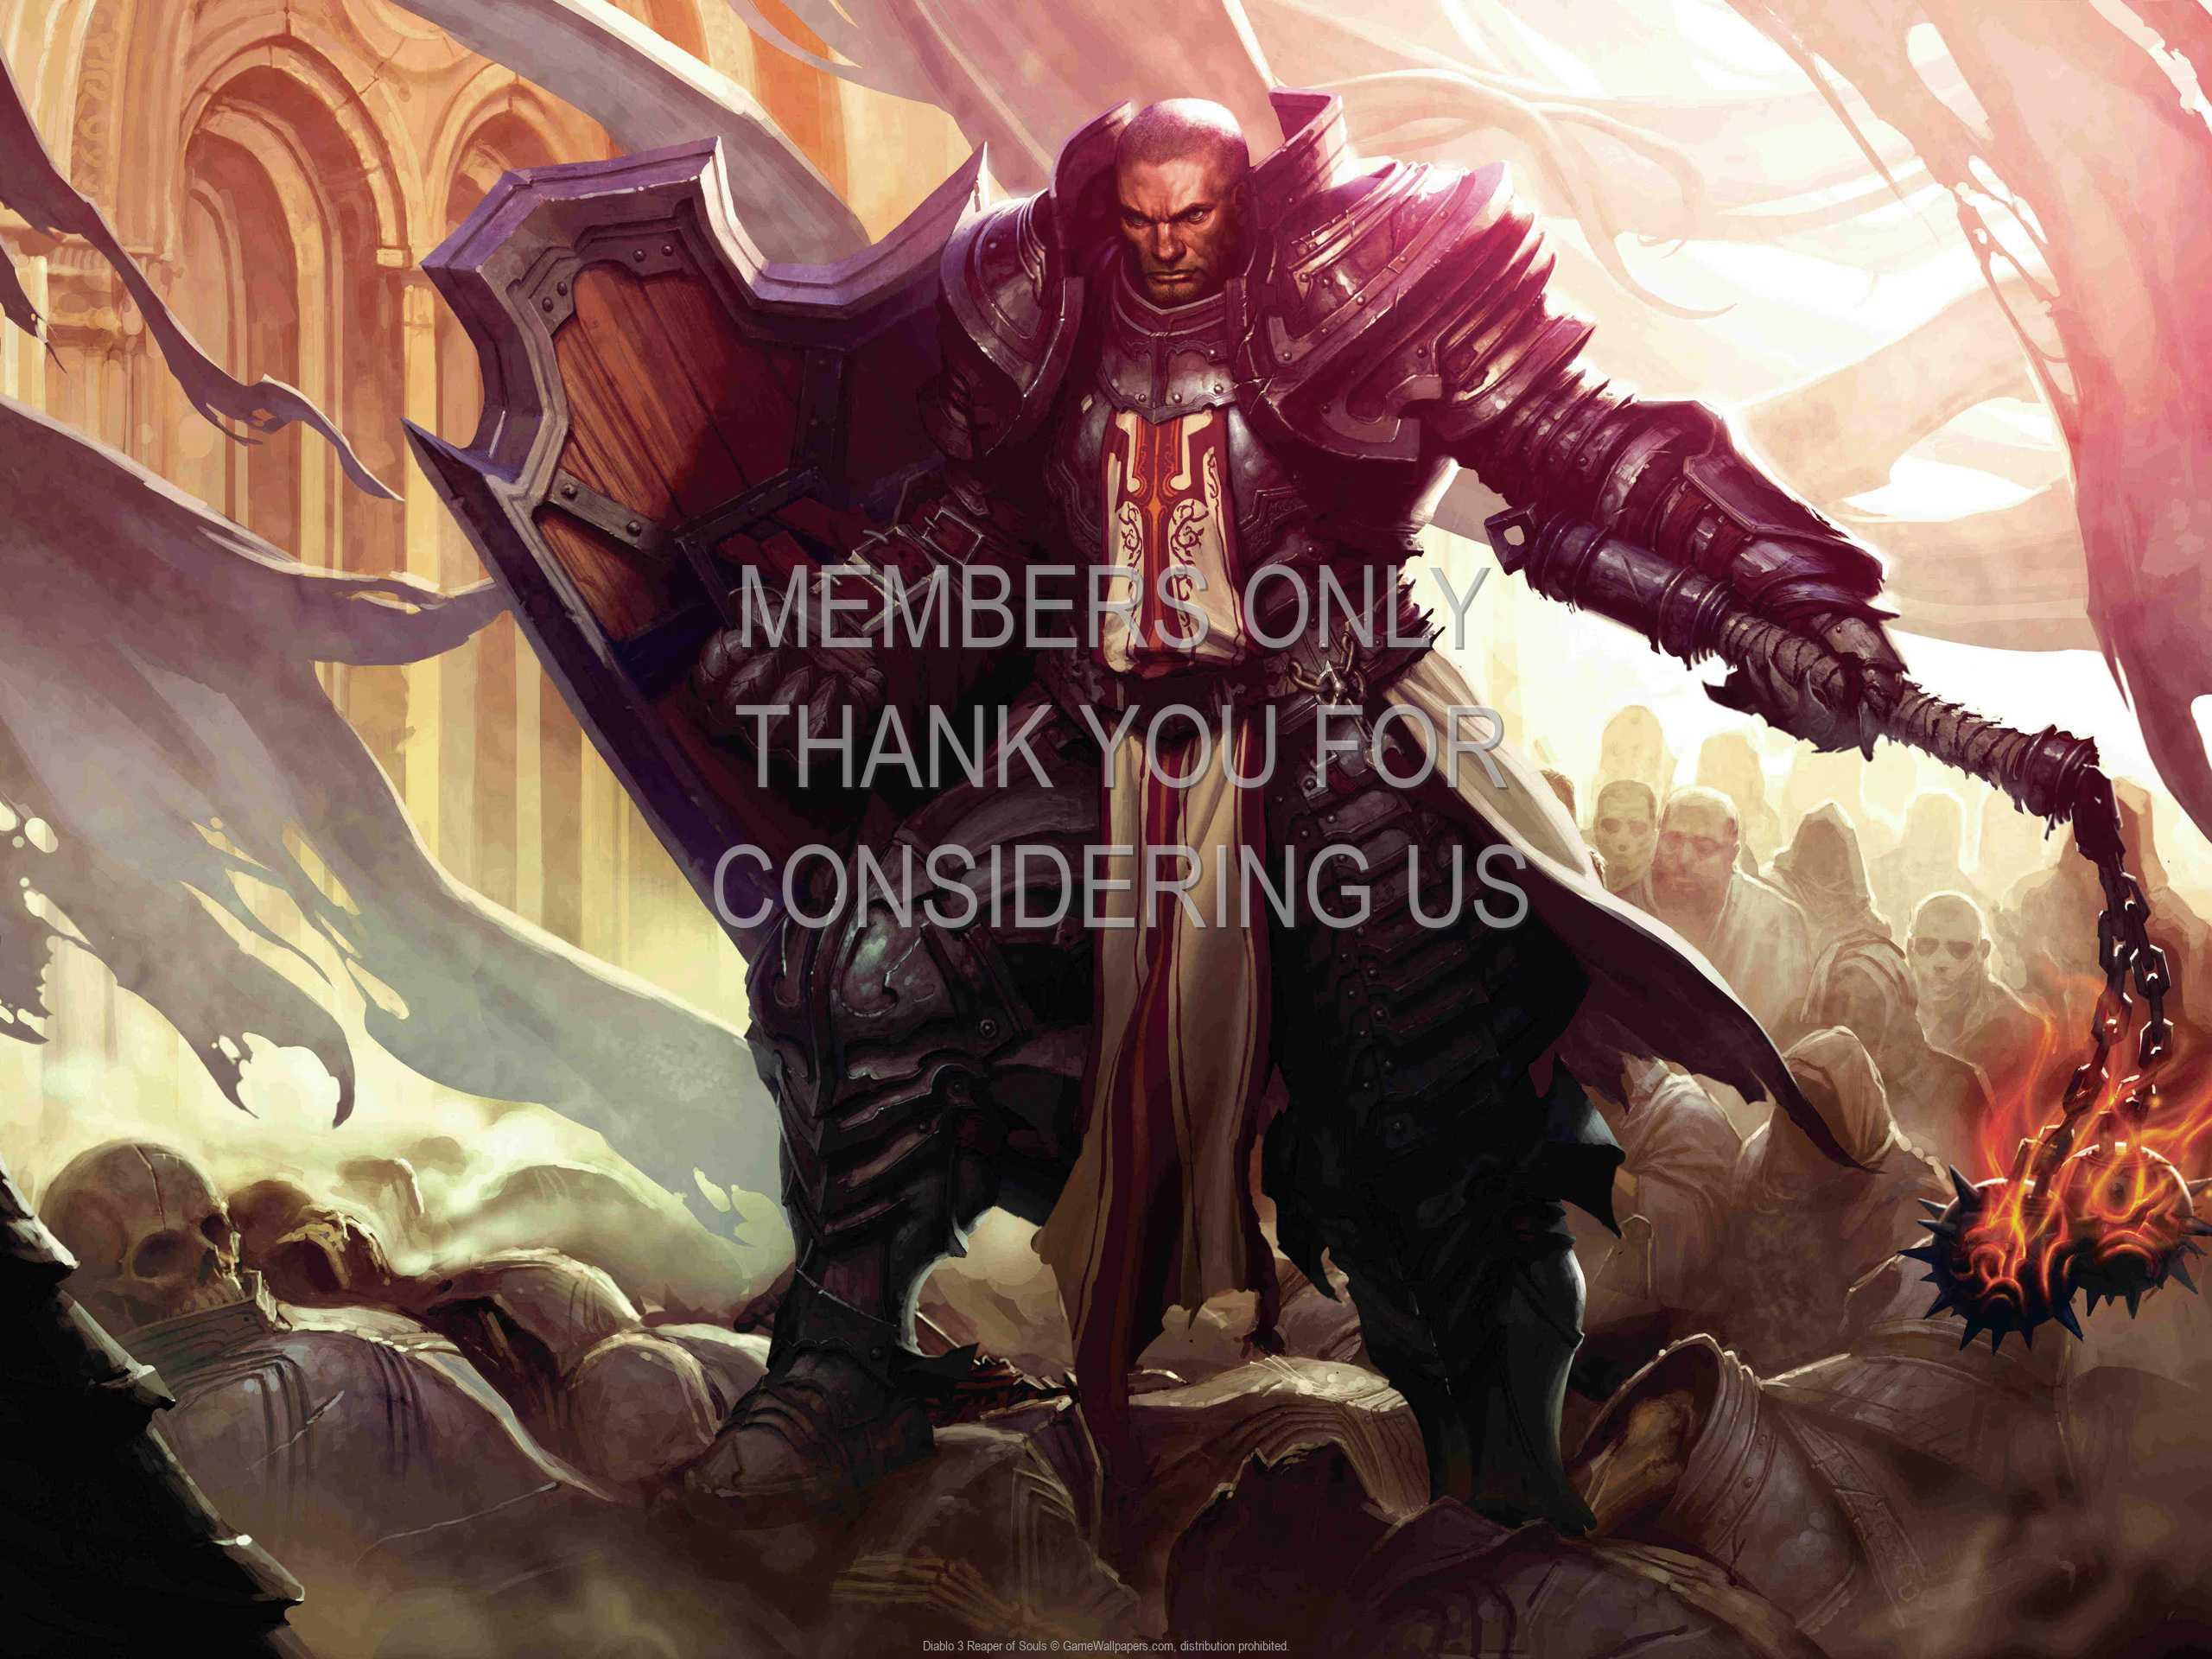 Diablo 3: Reaper of Souls 1080p Horizontal Mobile wallpaper or background 04